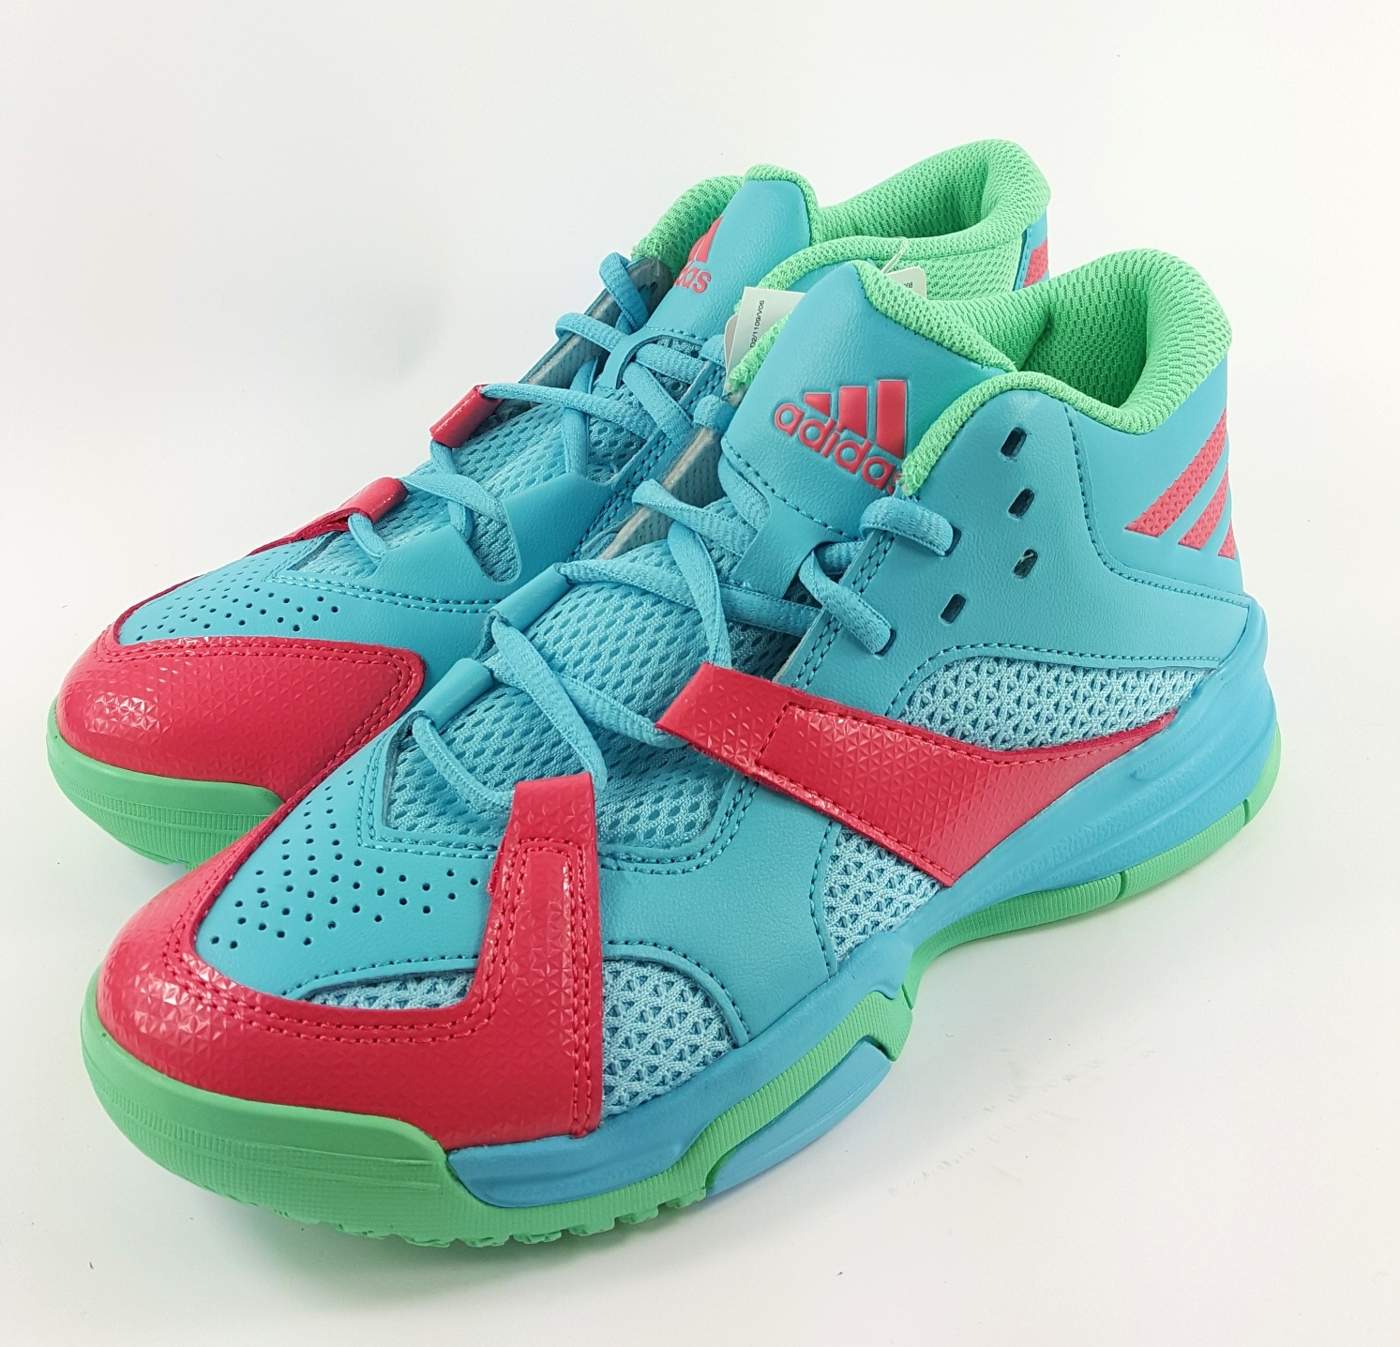 ADIDAS FIRST STEP K中筒兒童籃球鞋7 1童鞋7185水色